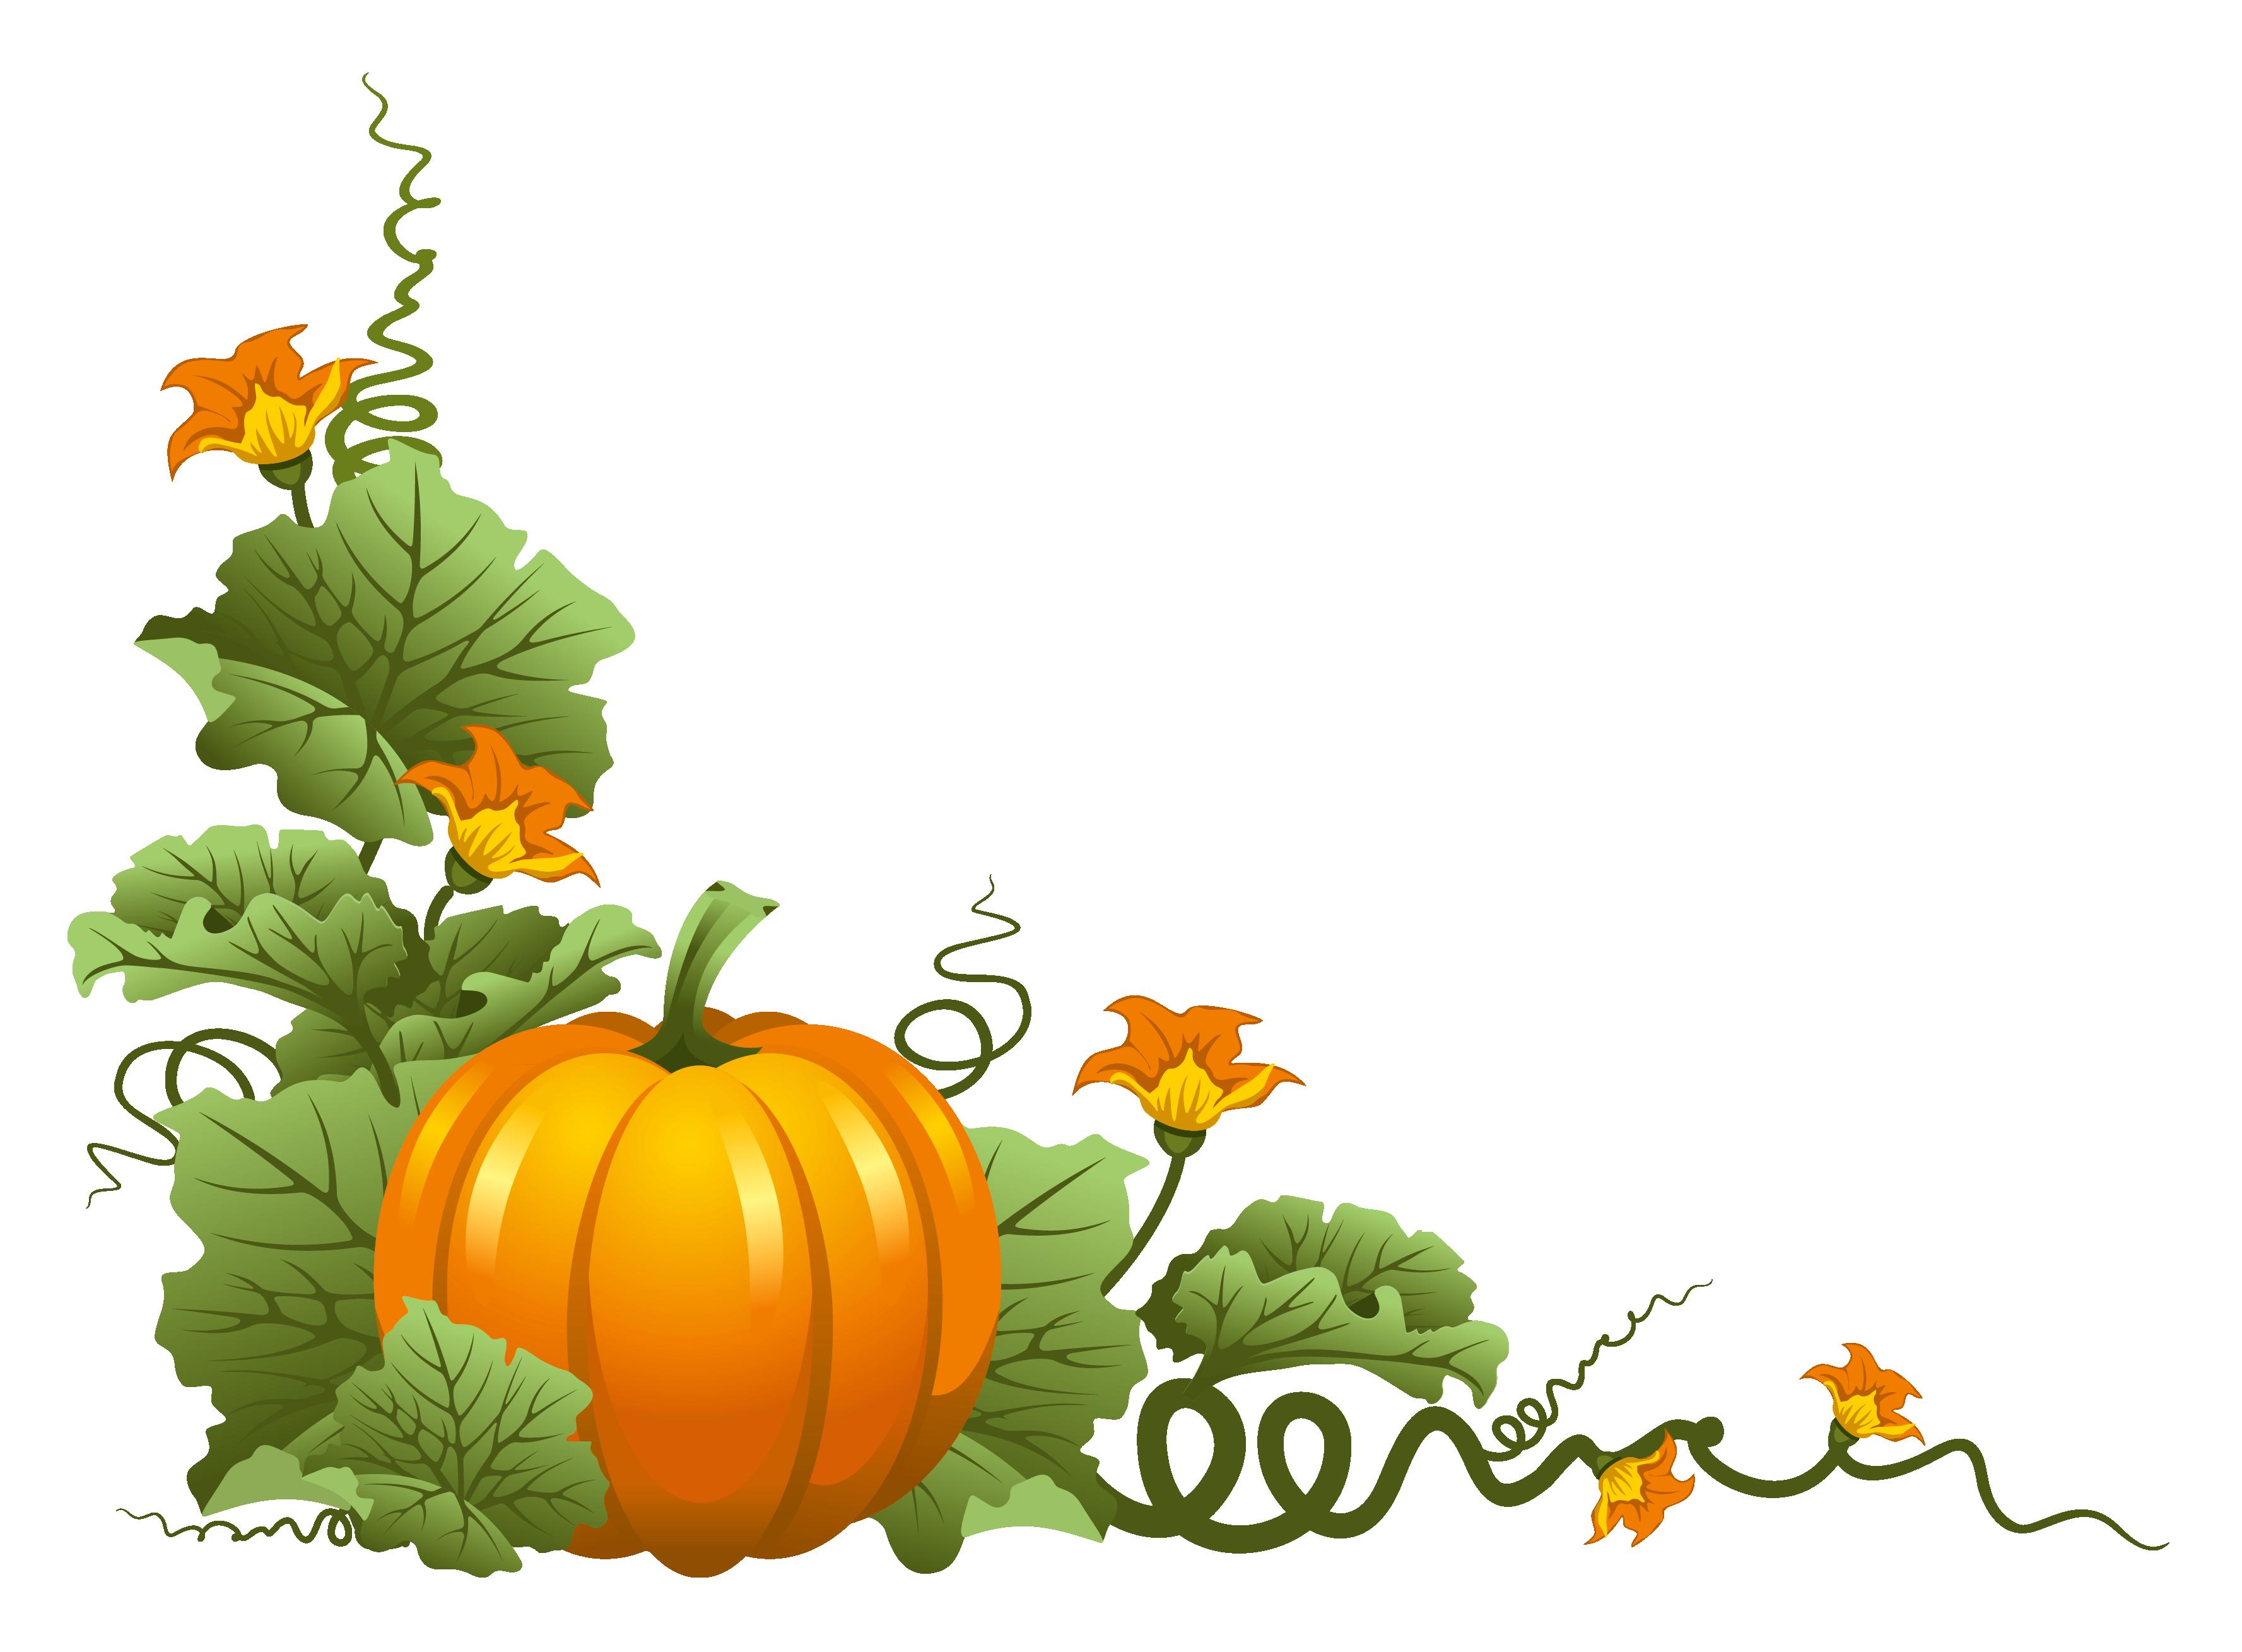 Clipart pumpkin garden, Clipart pumpkin garden Transparent.